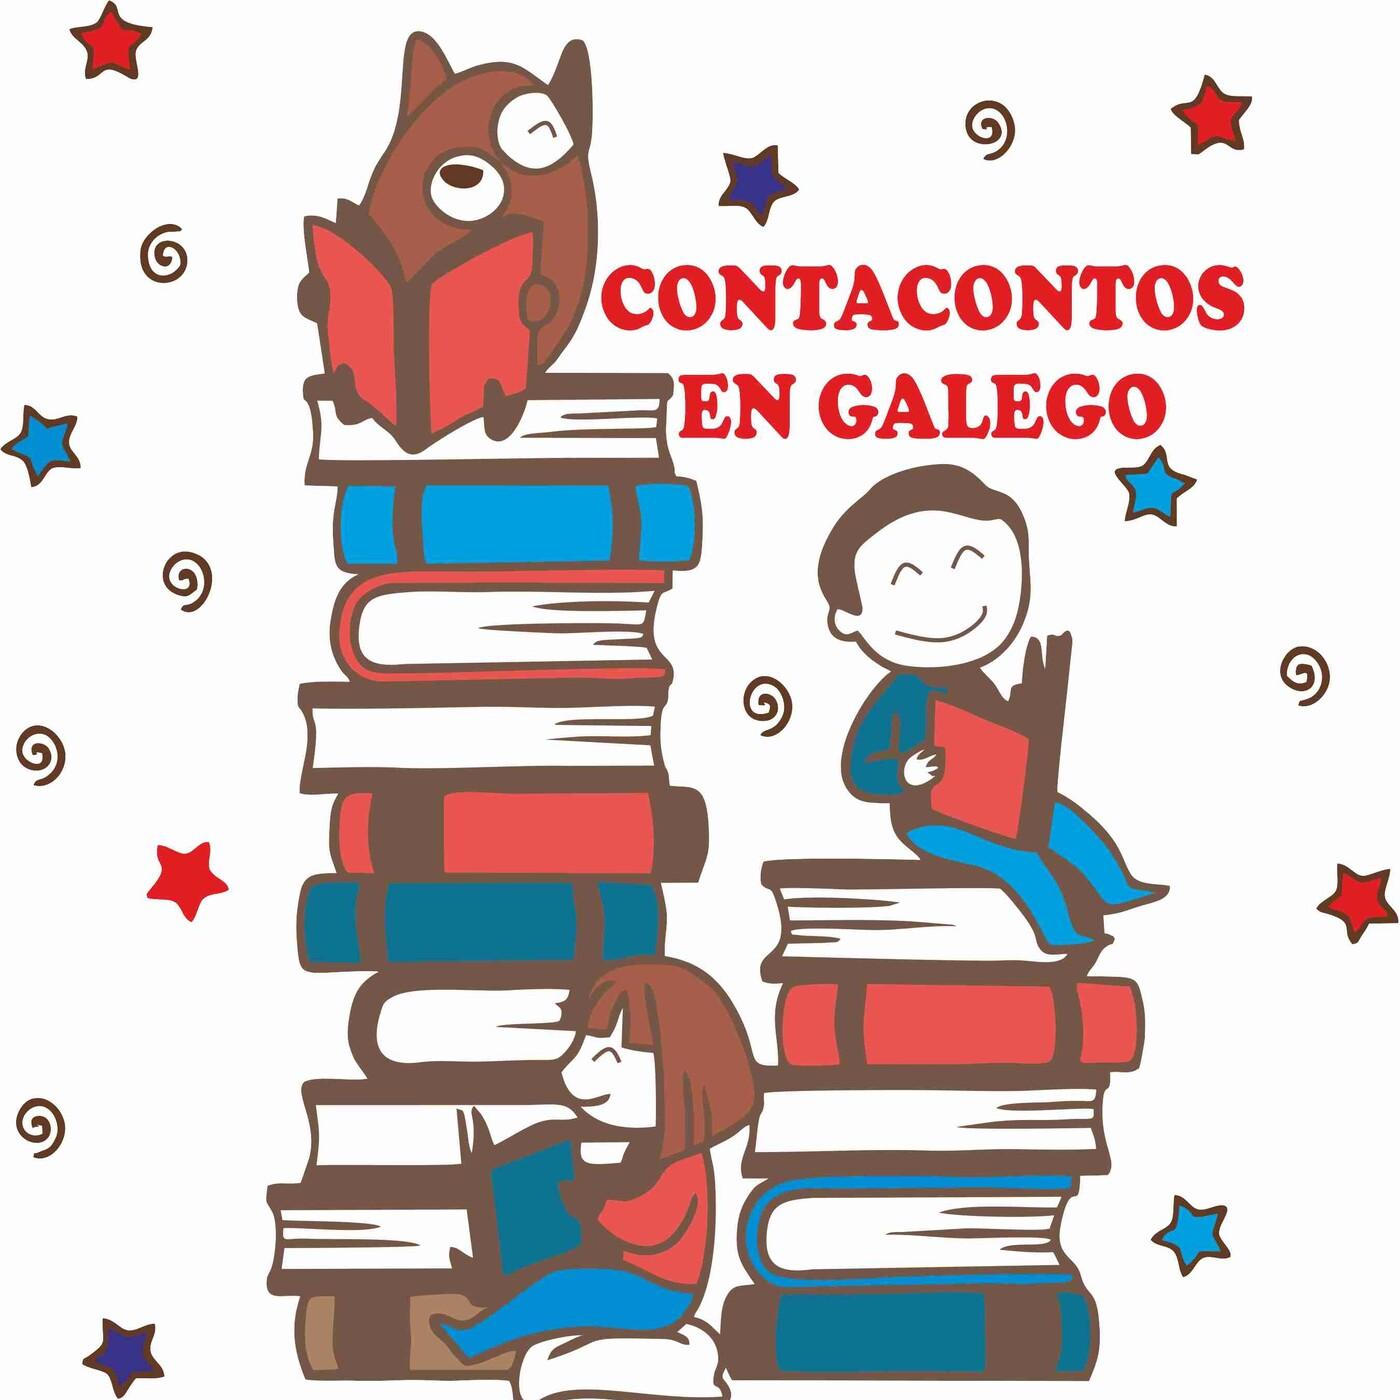 Contacontos en Galego